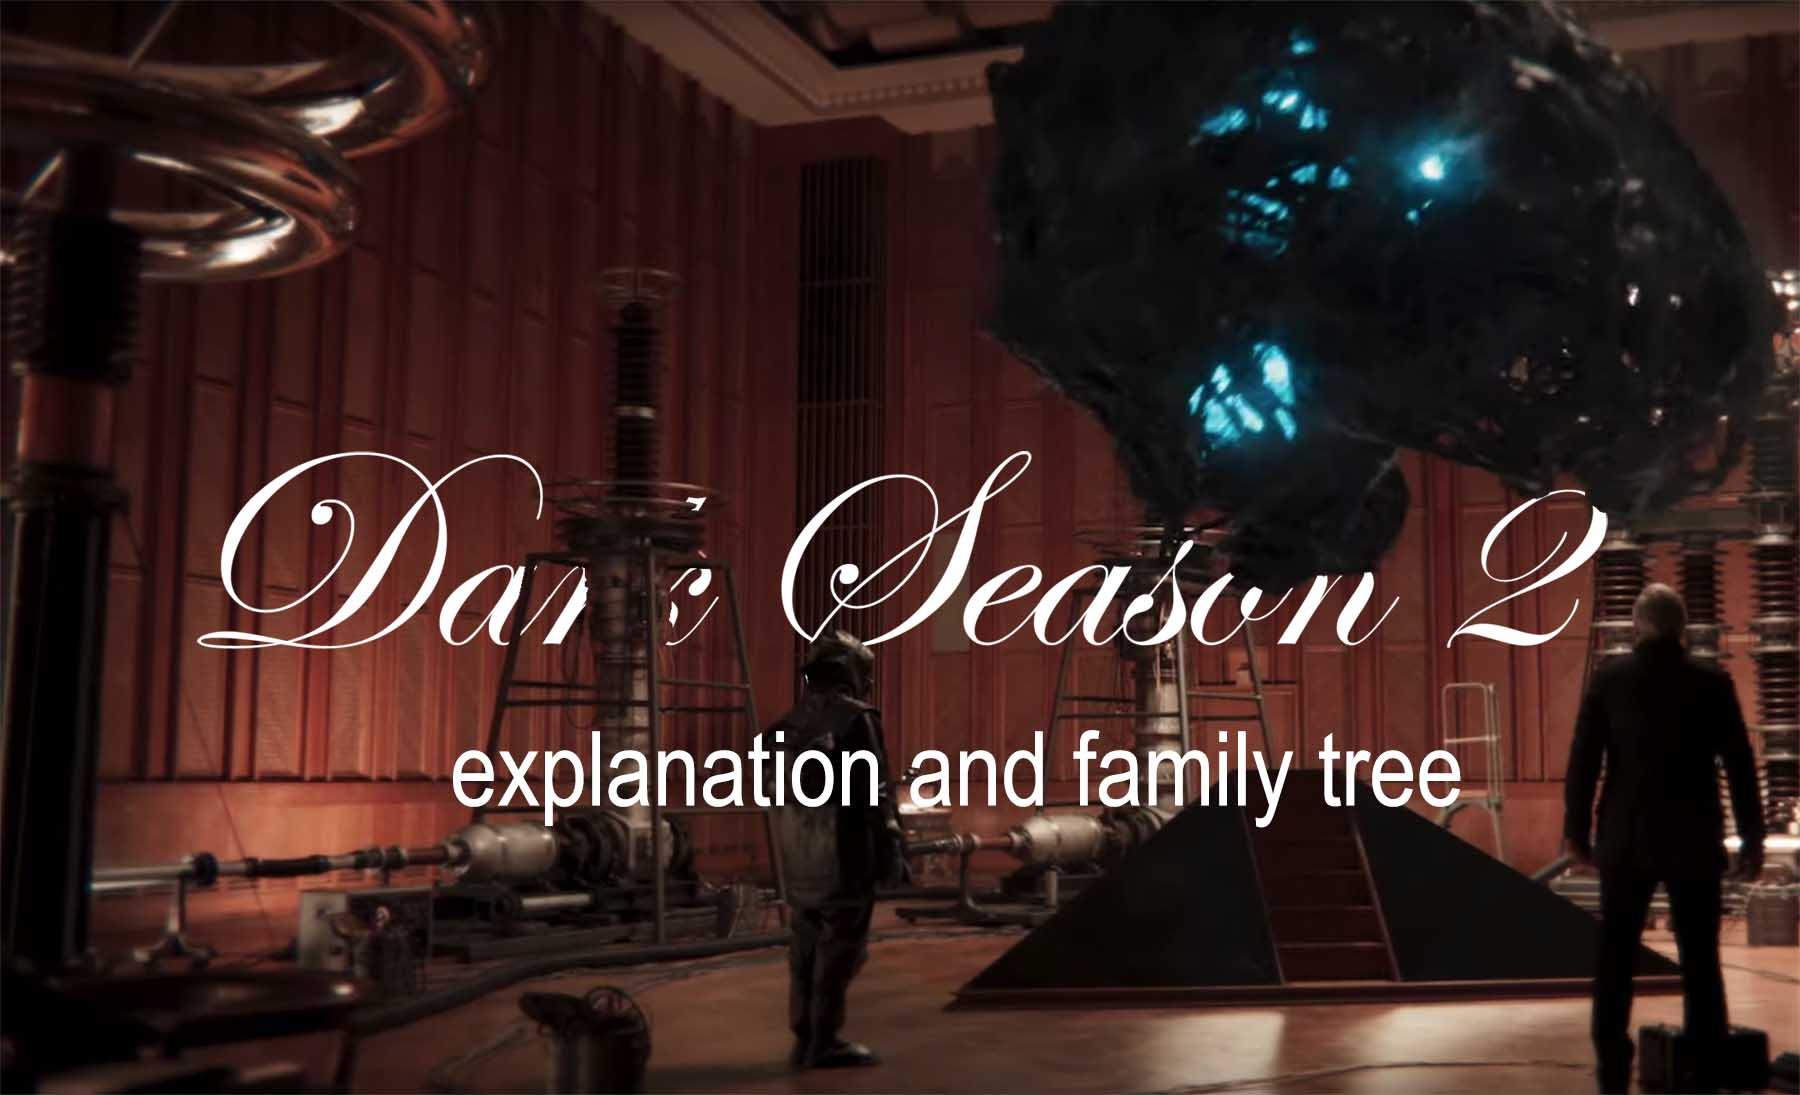 Netflix Show Dark Season 2 Walkthrough - Taylor Holmes inc